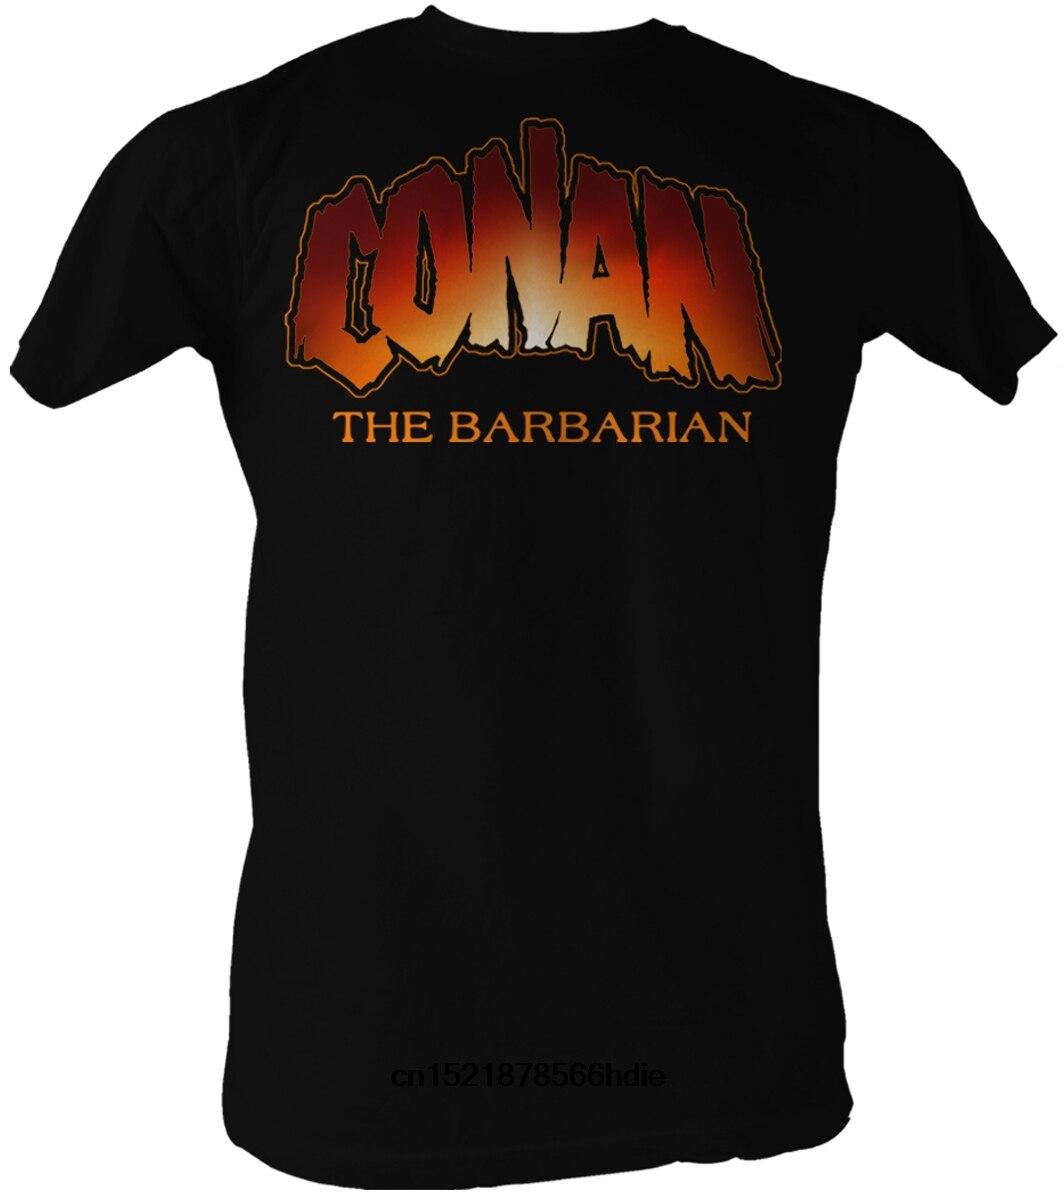 55ead3c4038 Gildan funny t shirt men novelty tshirt Conan the Barbarian T Shirt New  Logo-in T-Shirts from Men s Clothing on Aliexpress.com